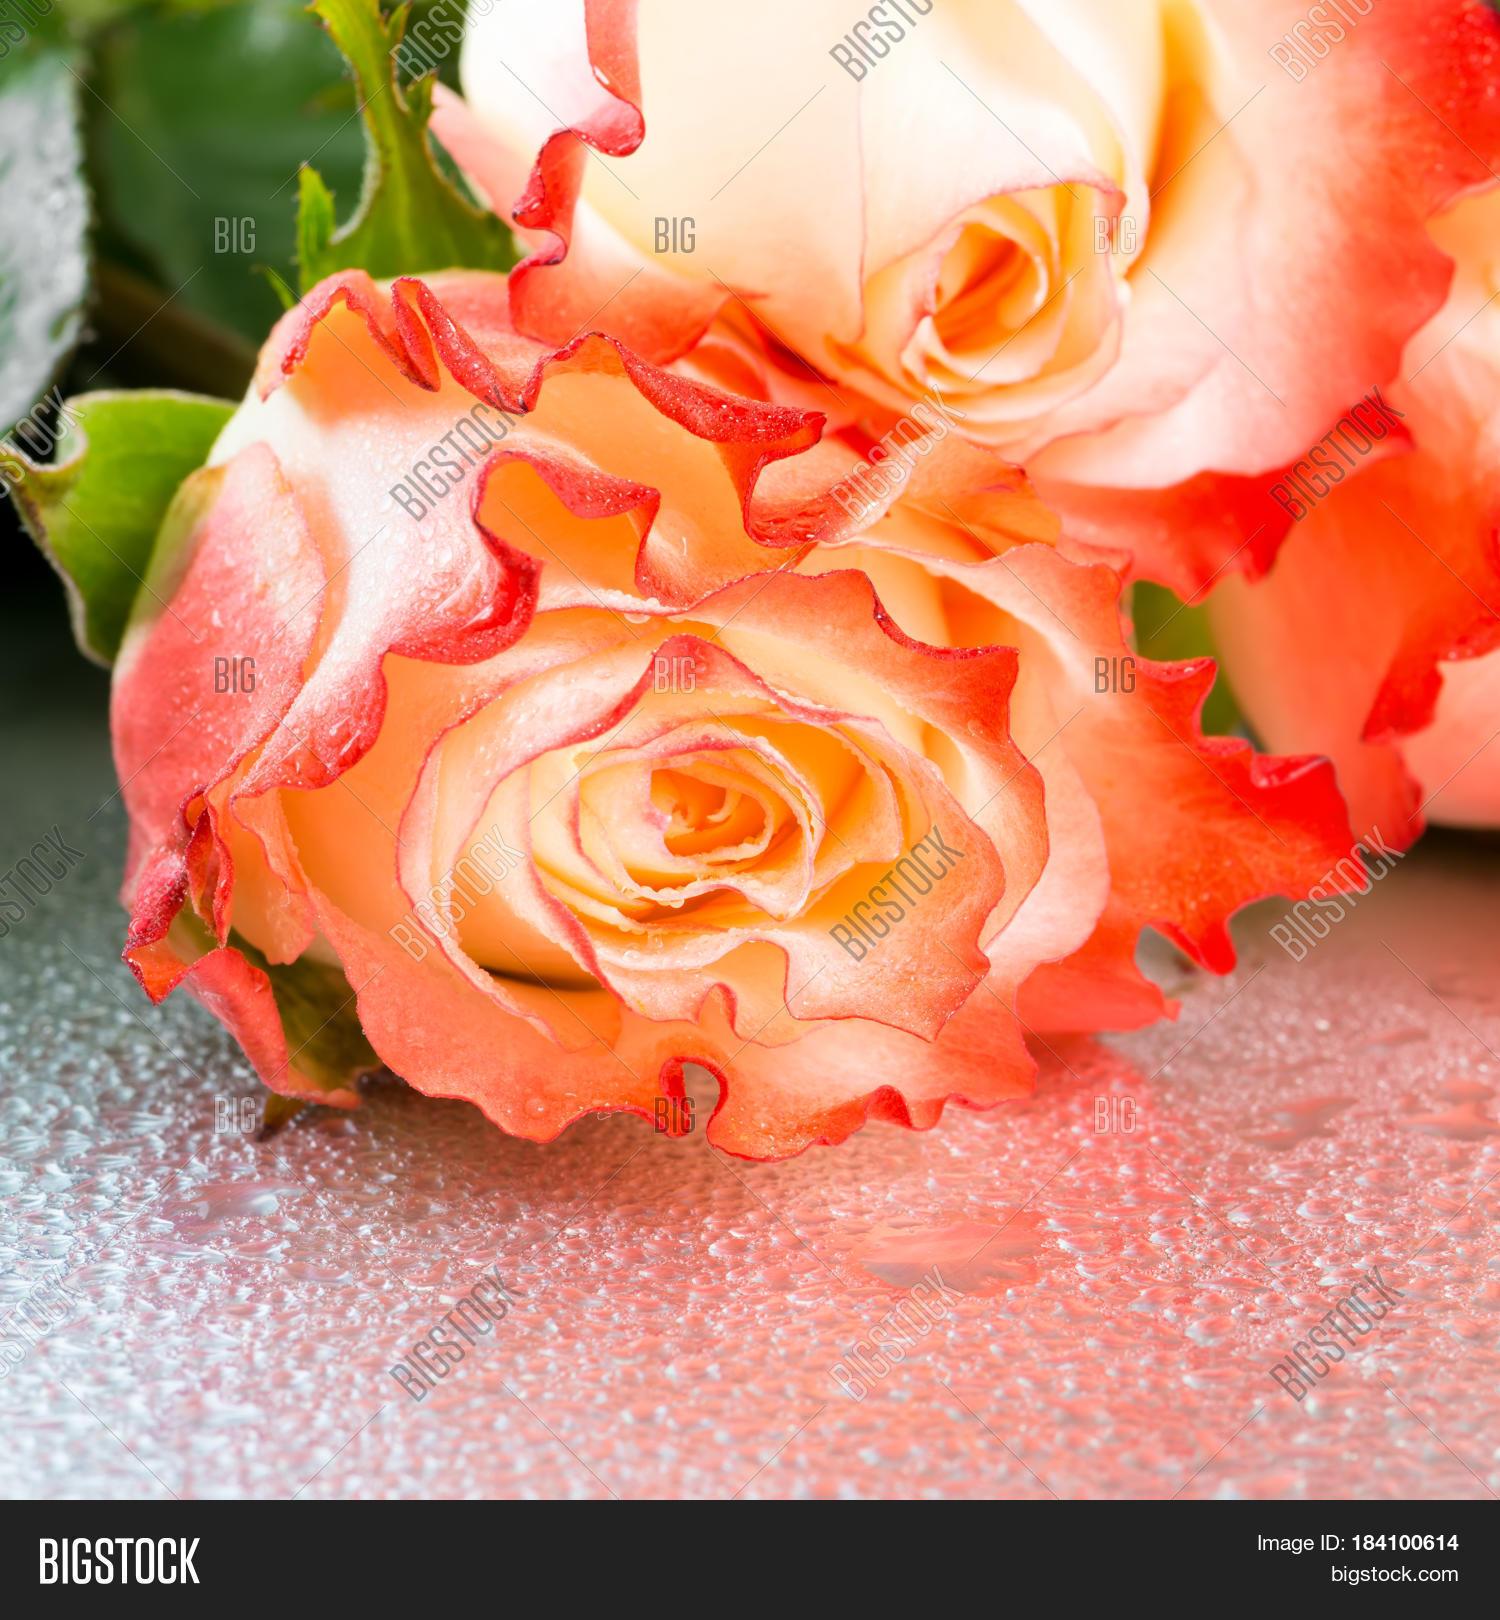 Beautiful Rose Flowers Image Photo Free Trial Bigstock